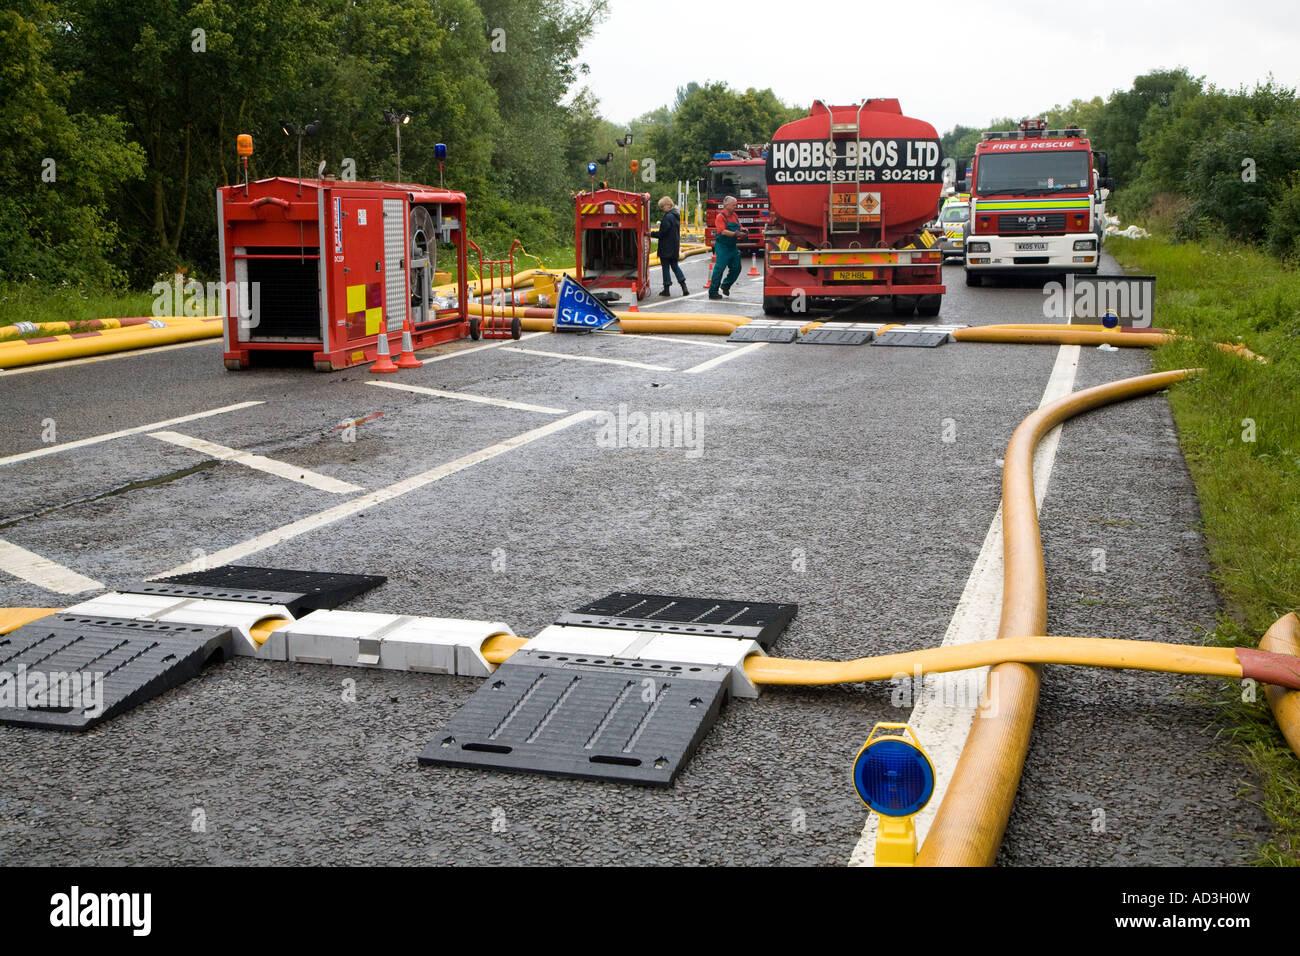 firebrigade - Stock Image